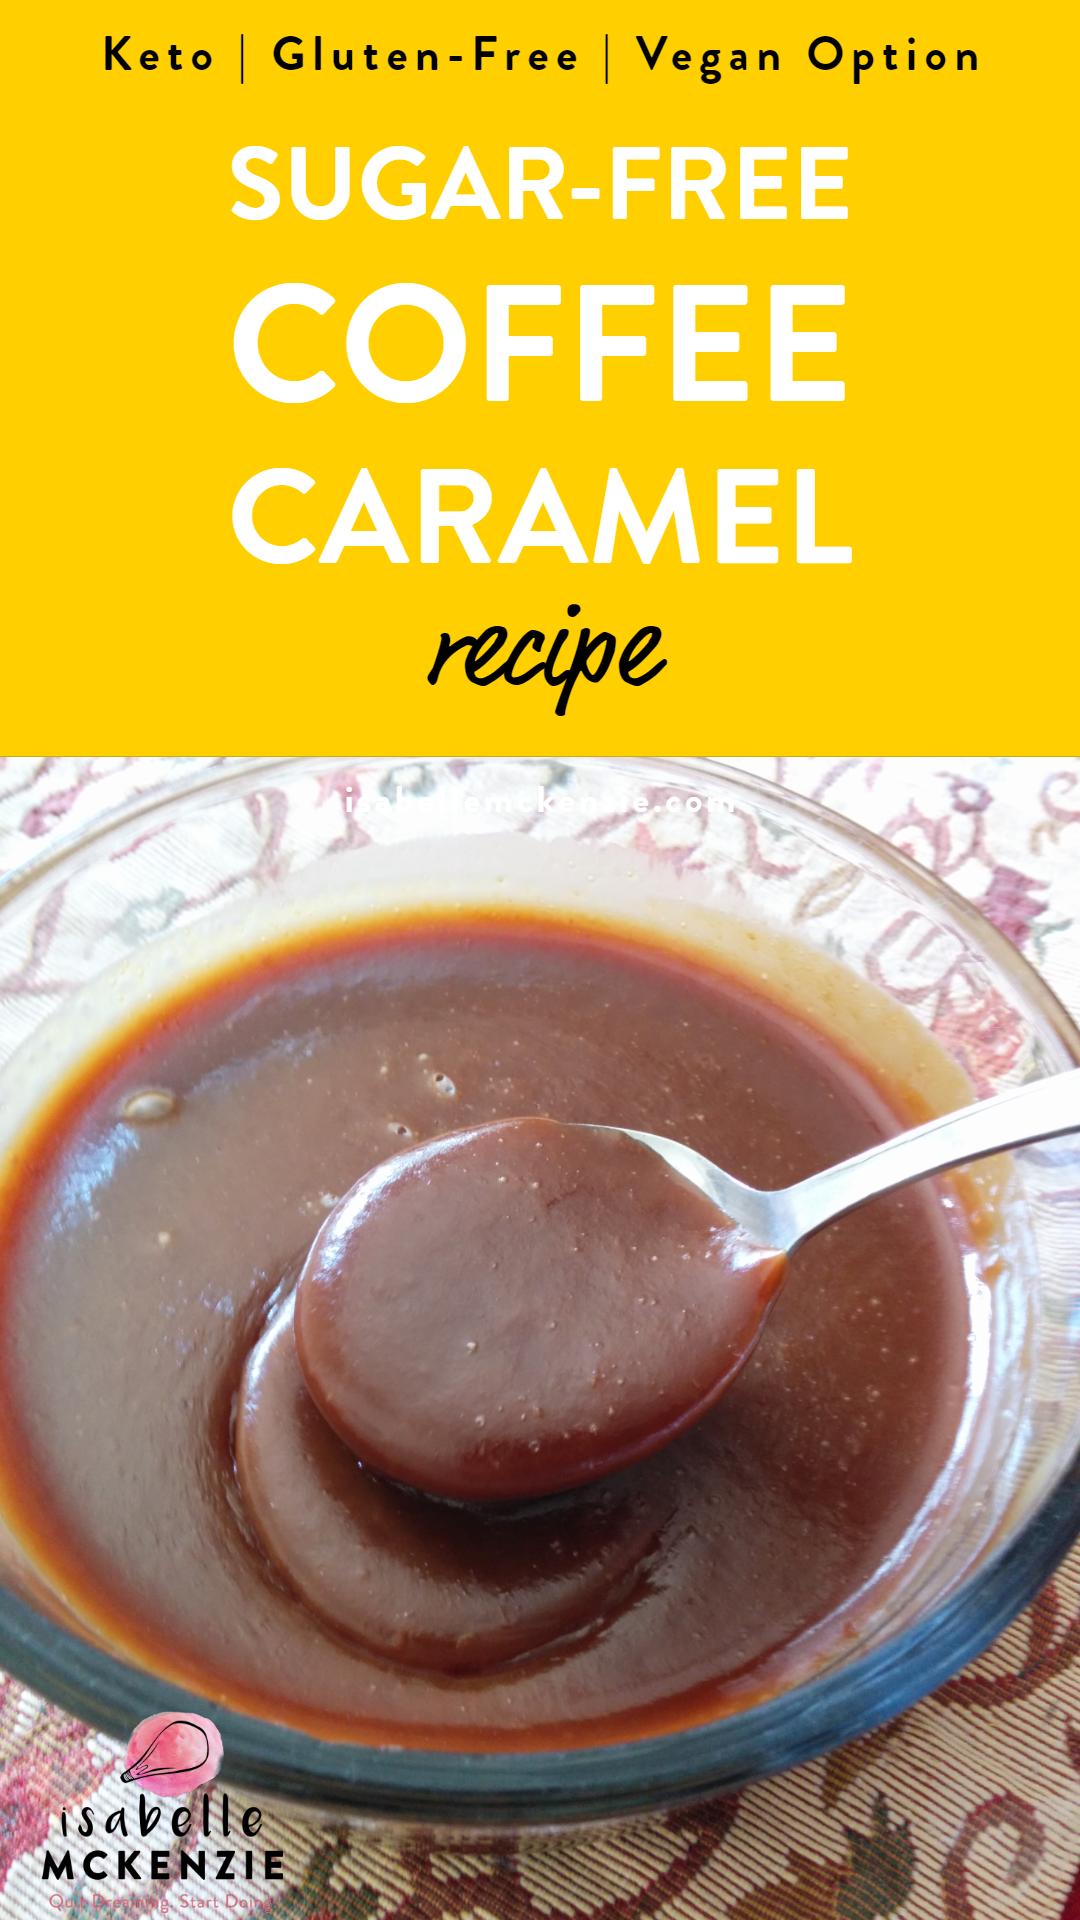 Sugar-Free Thick Coffee Caramel Sauce (Low-Carb, Keto, Gluten-Free, Vegan Option)